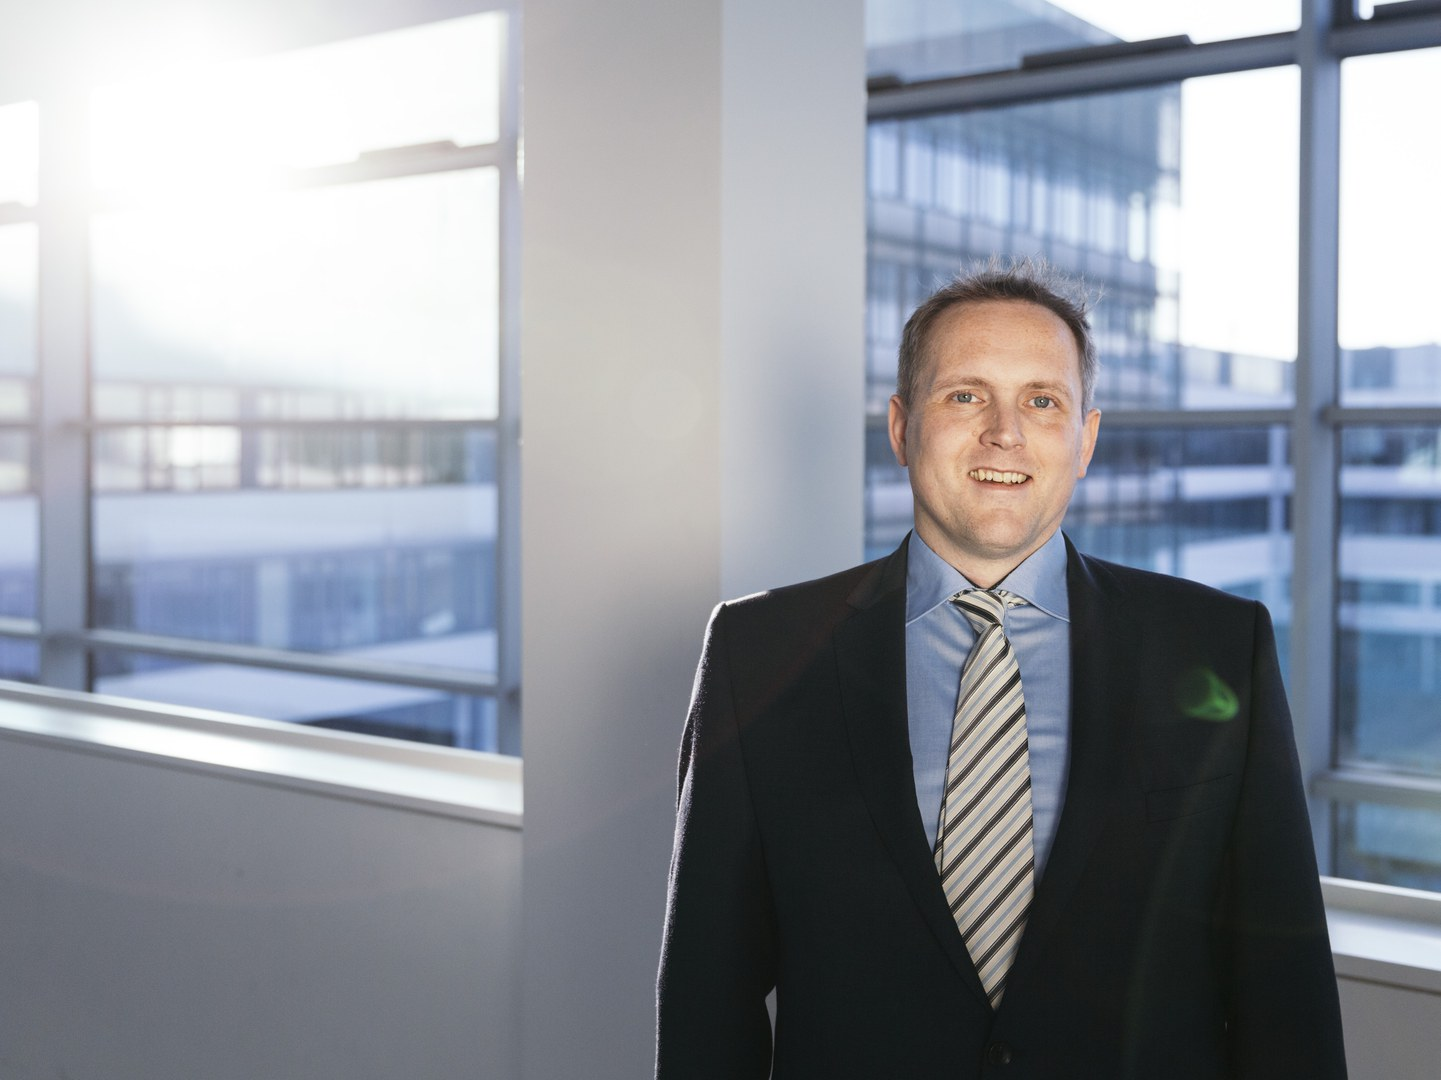 Prof. Volker Busskamp